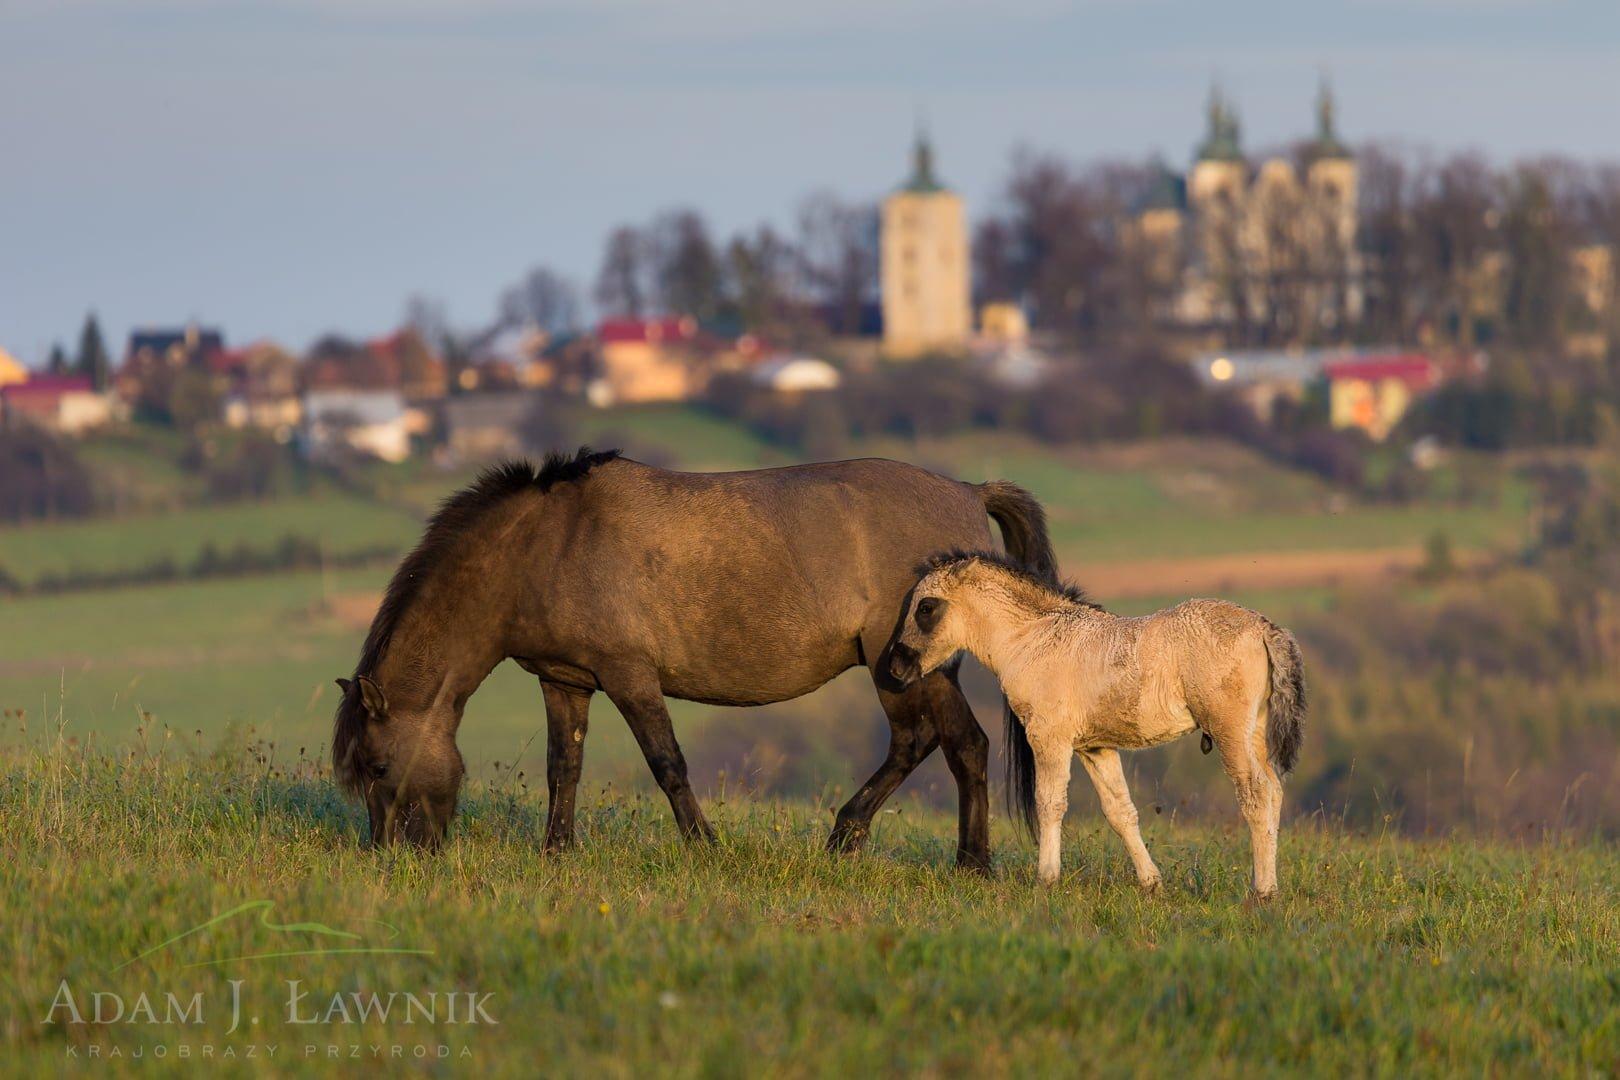 Turnica National Park, Poland 1410-01363C